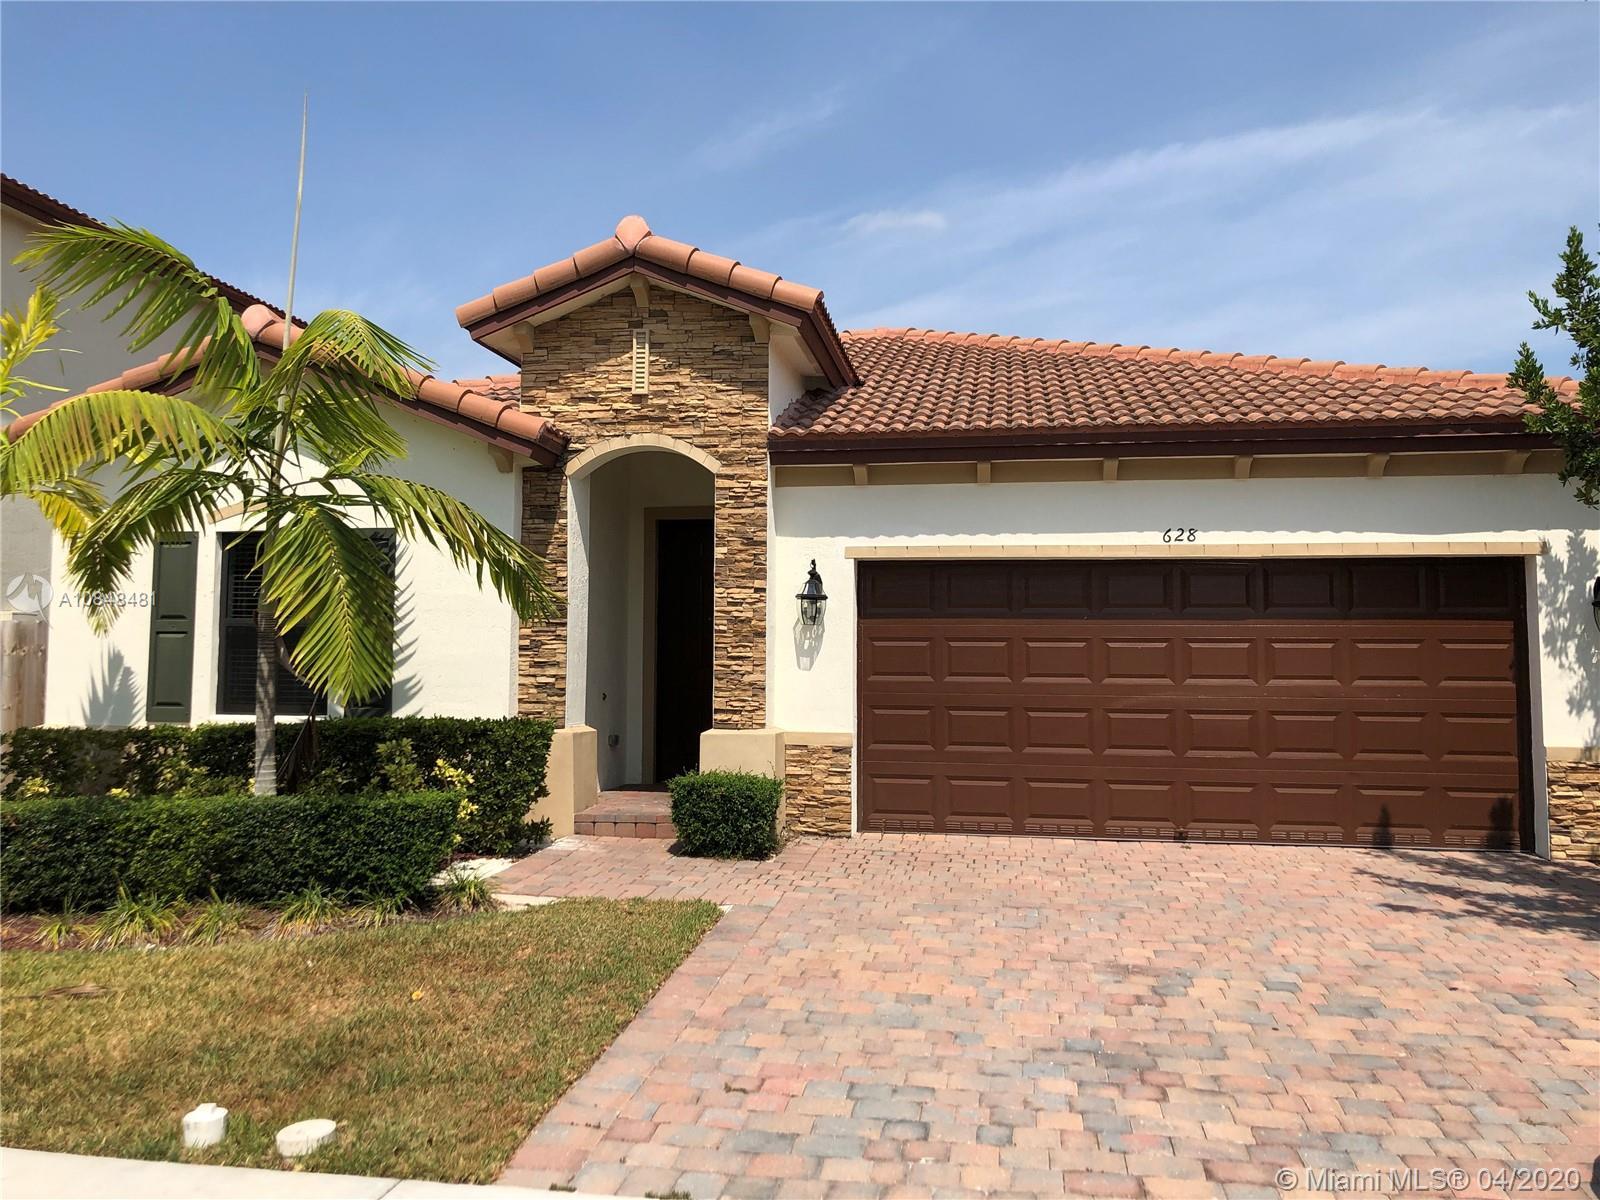 628 SE 37th Ter #628, Homestead, FL 33033 - Homestead, FL real estate listing